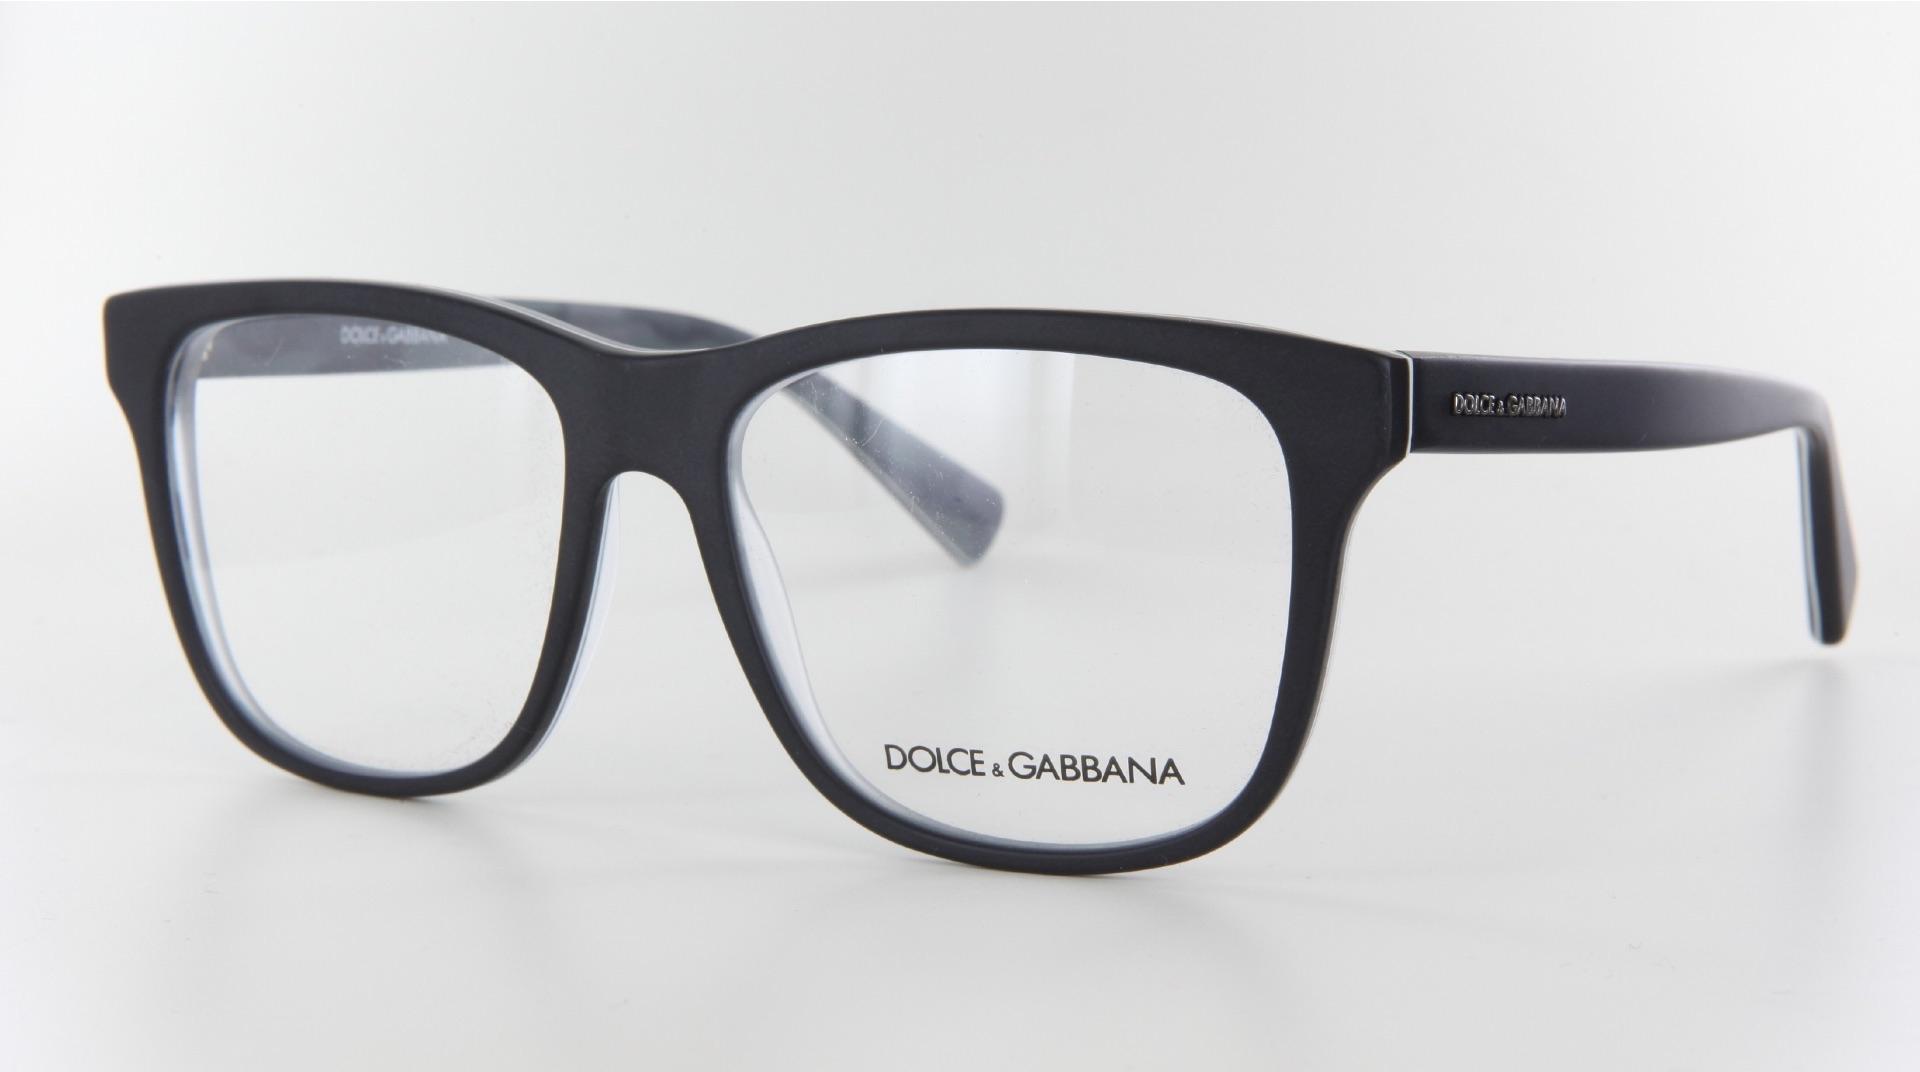 Dolce & Gabbana - ref: 72784